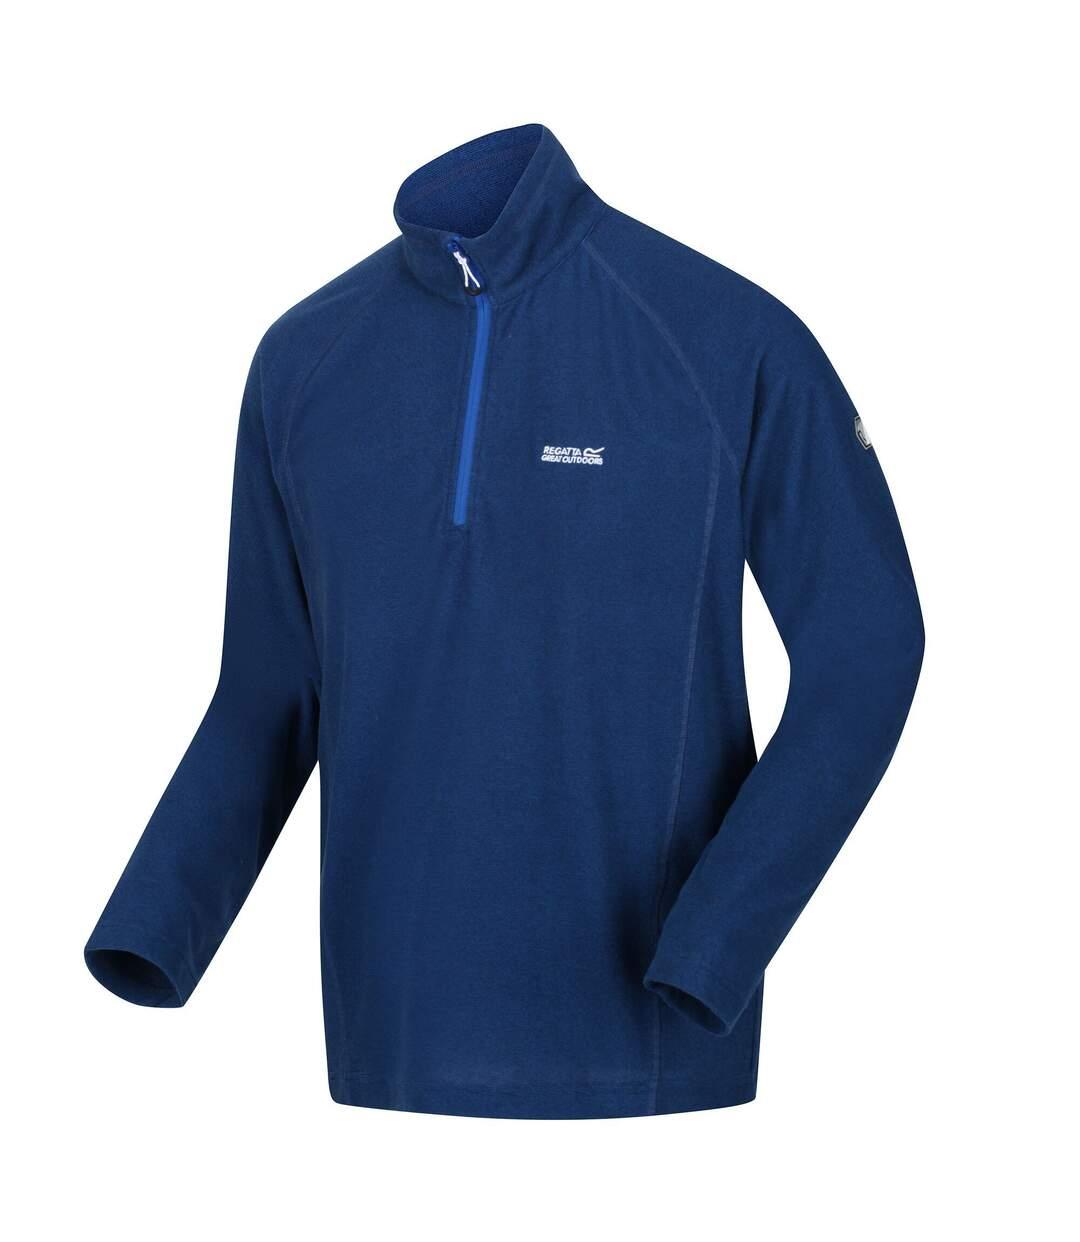 Regatta Great Outdoors Mens Montes Fleece Top (Captains Blue) - UTRG2131